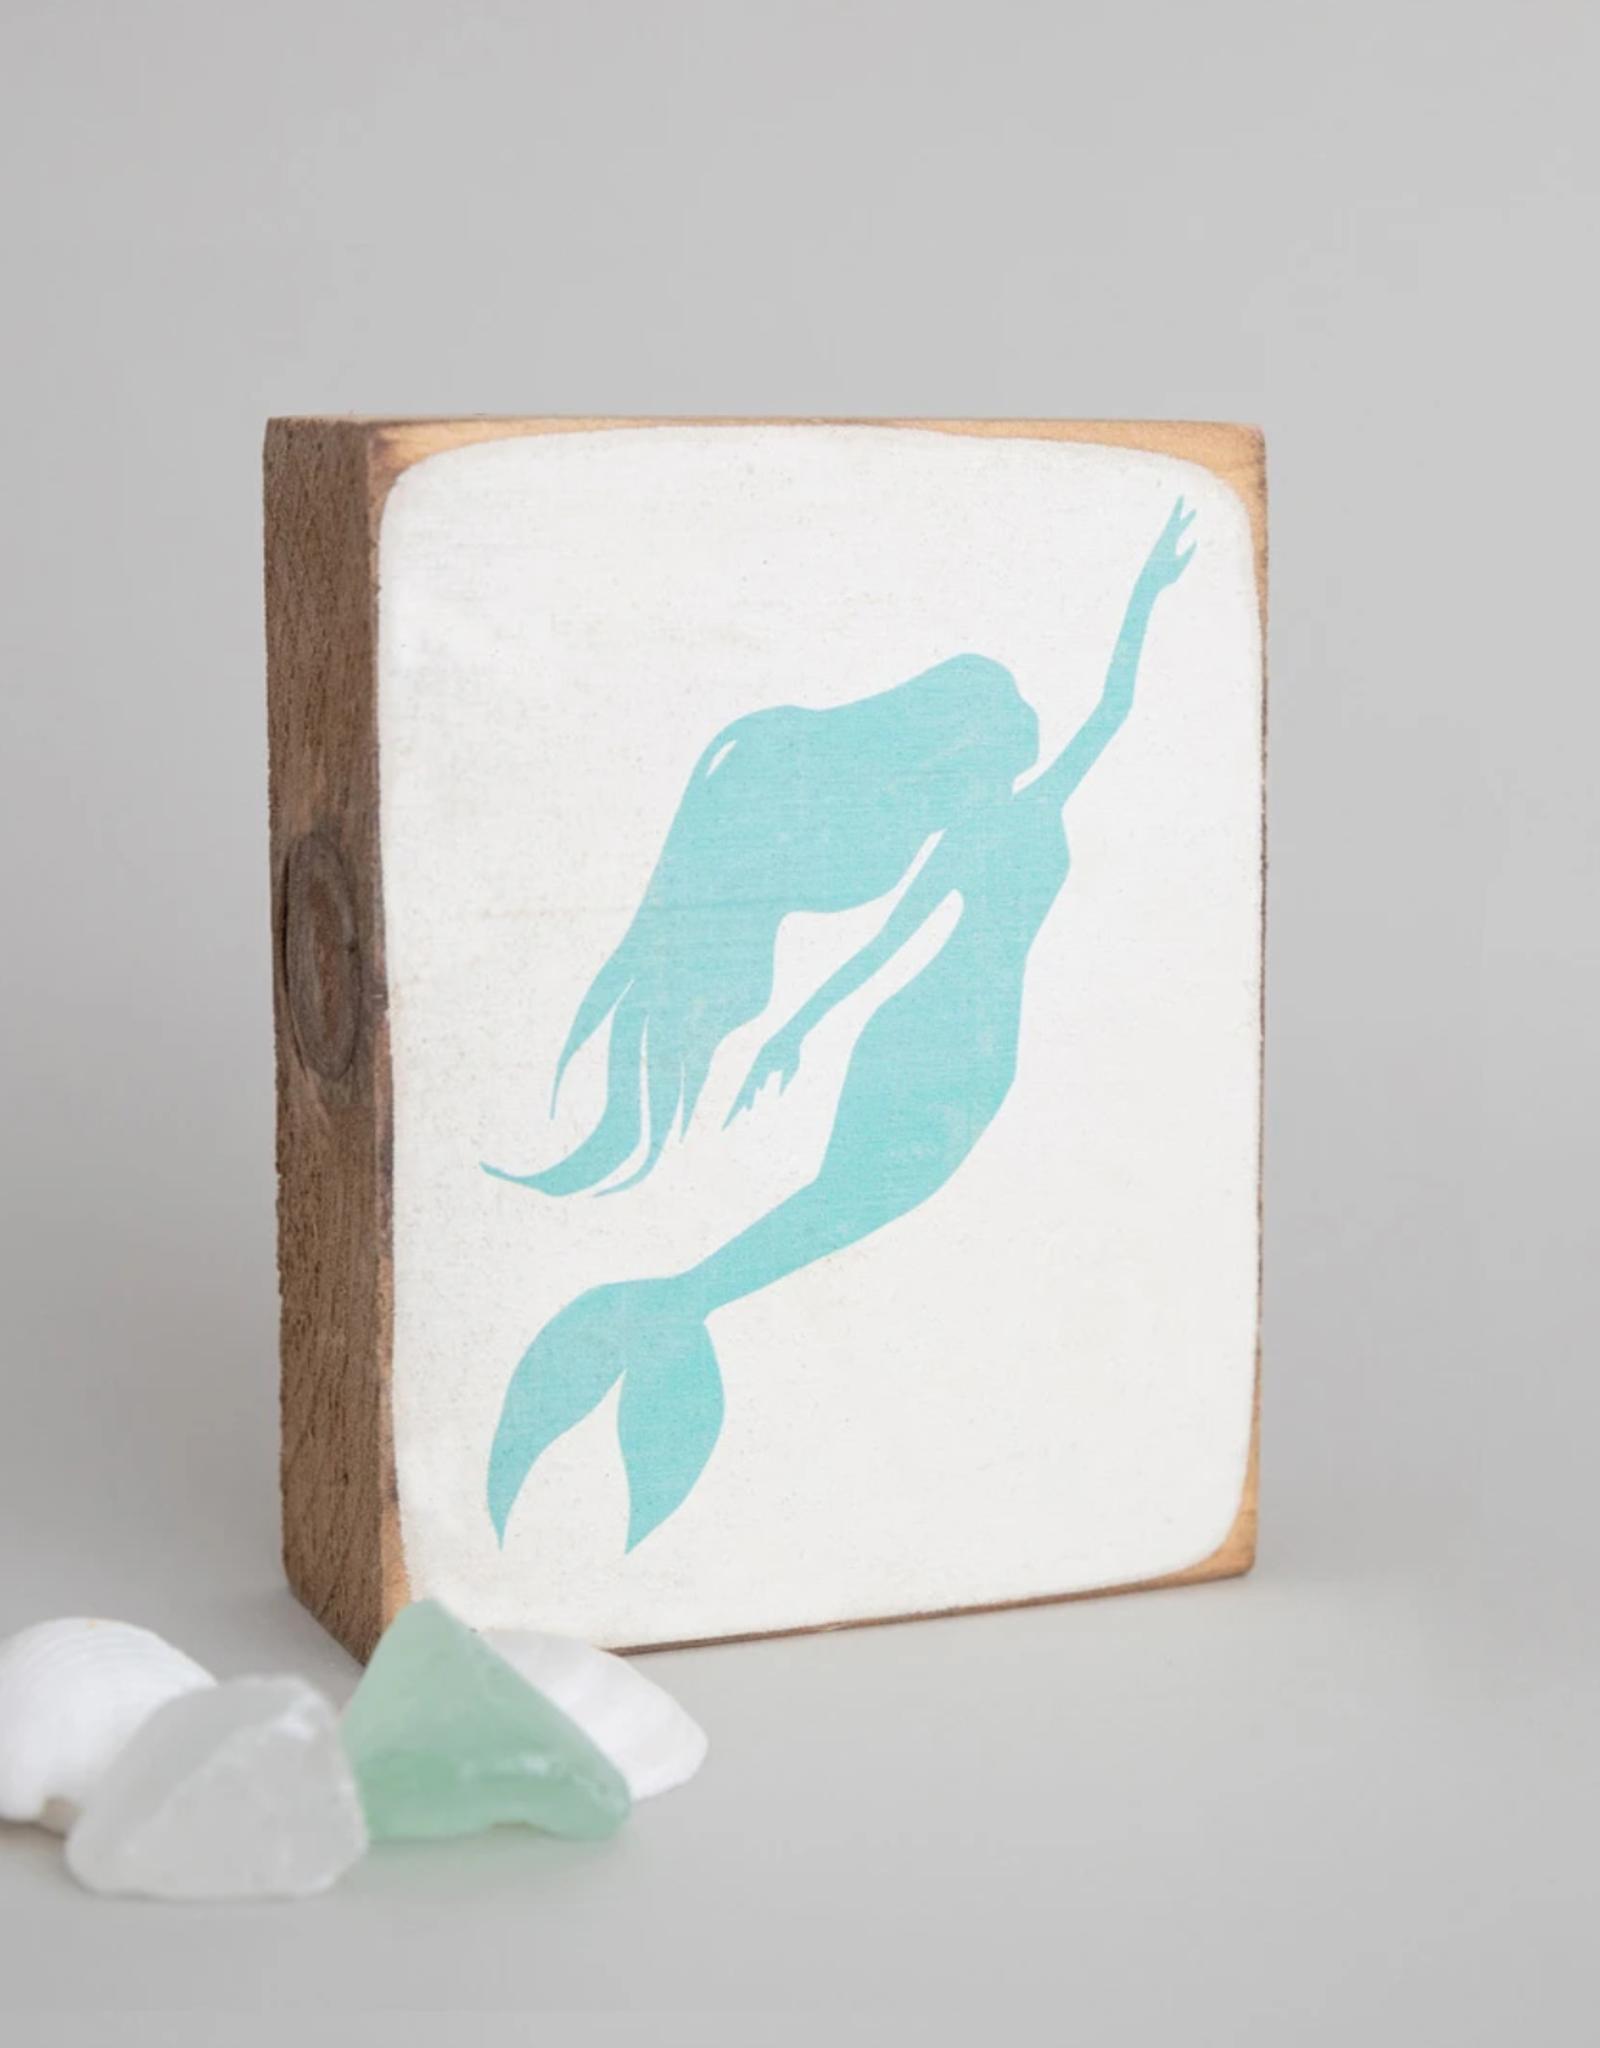 Rustic Marlin Rustic Marlin - Mermaid Symbol Block